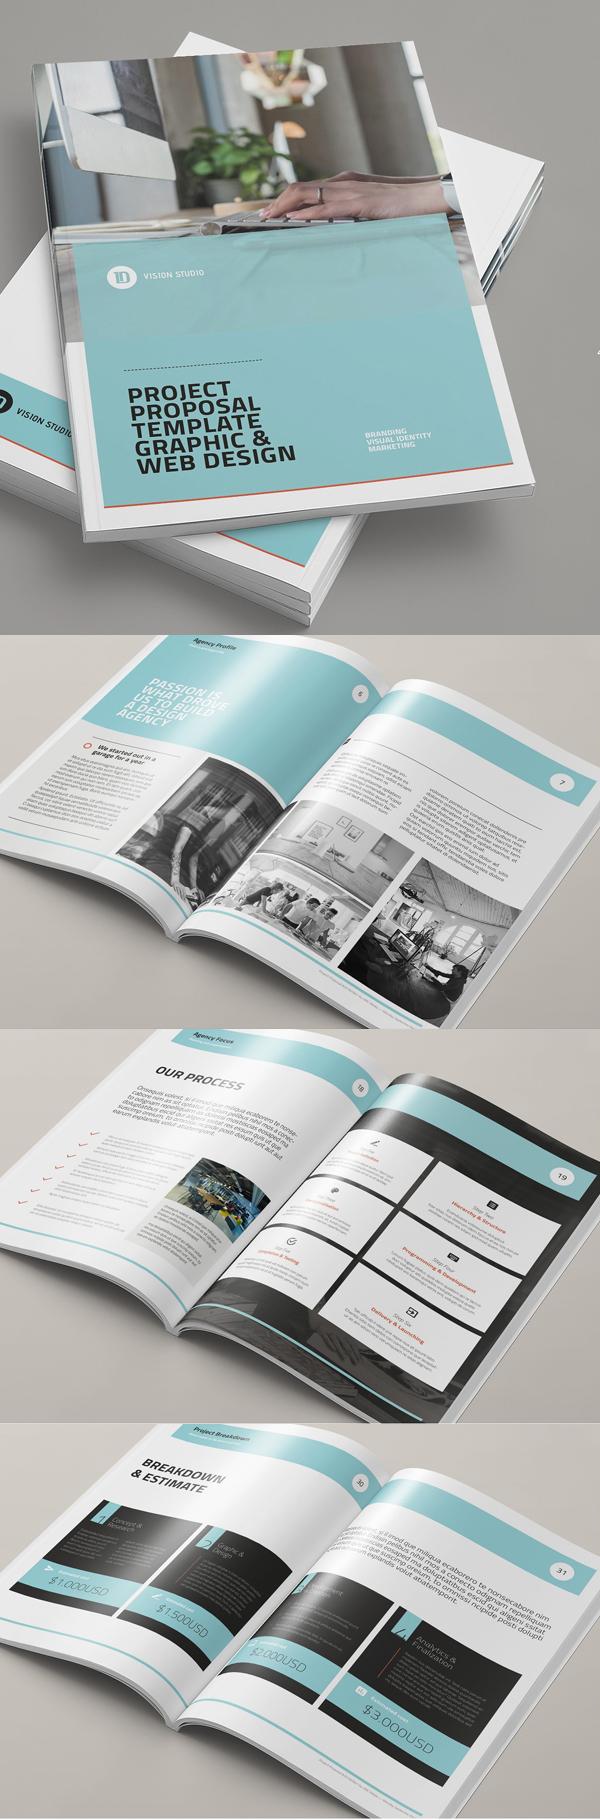 100 Professional Corporate Brochure Templates - 30